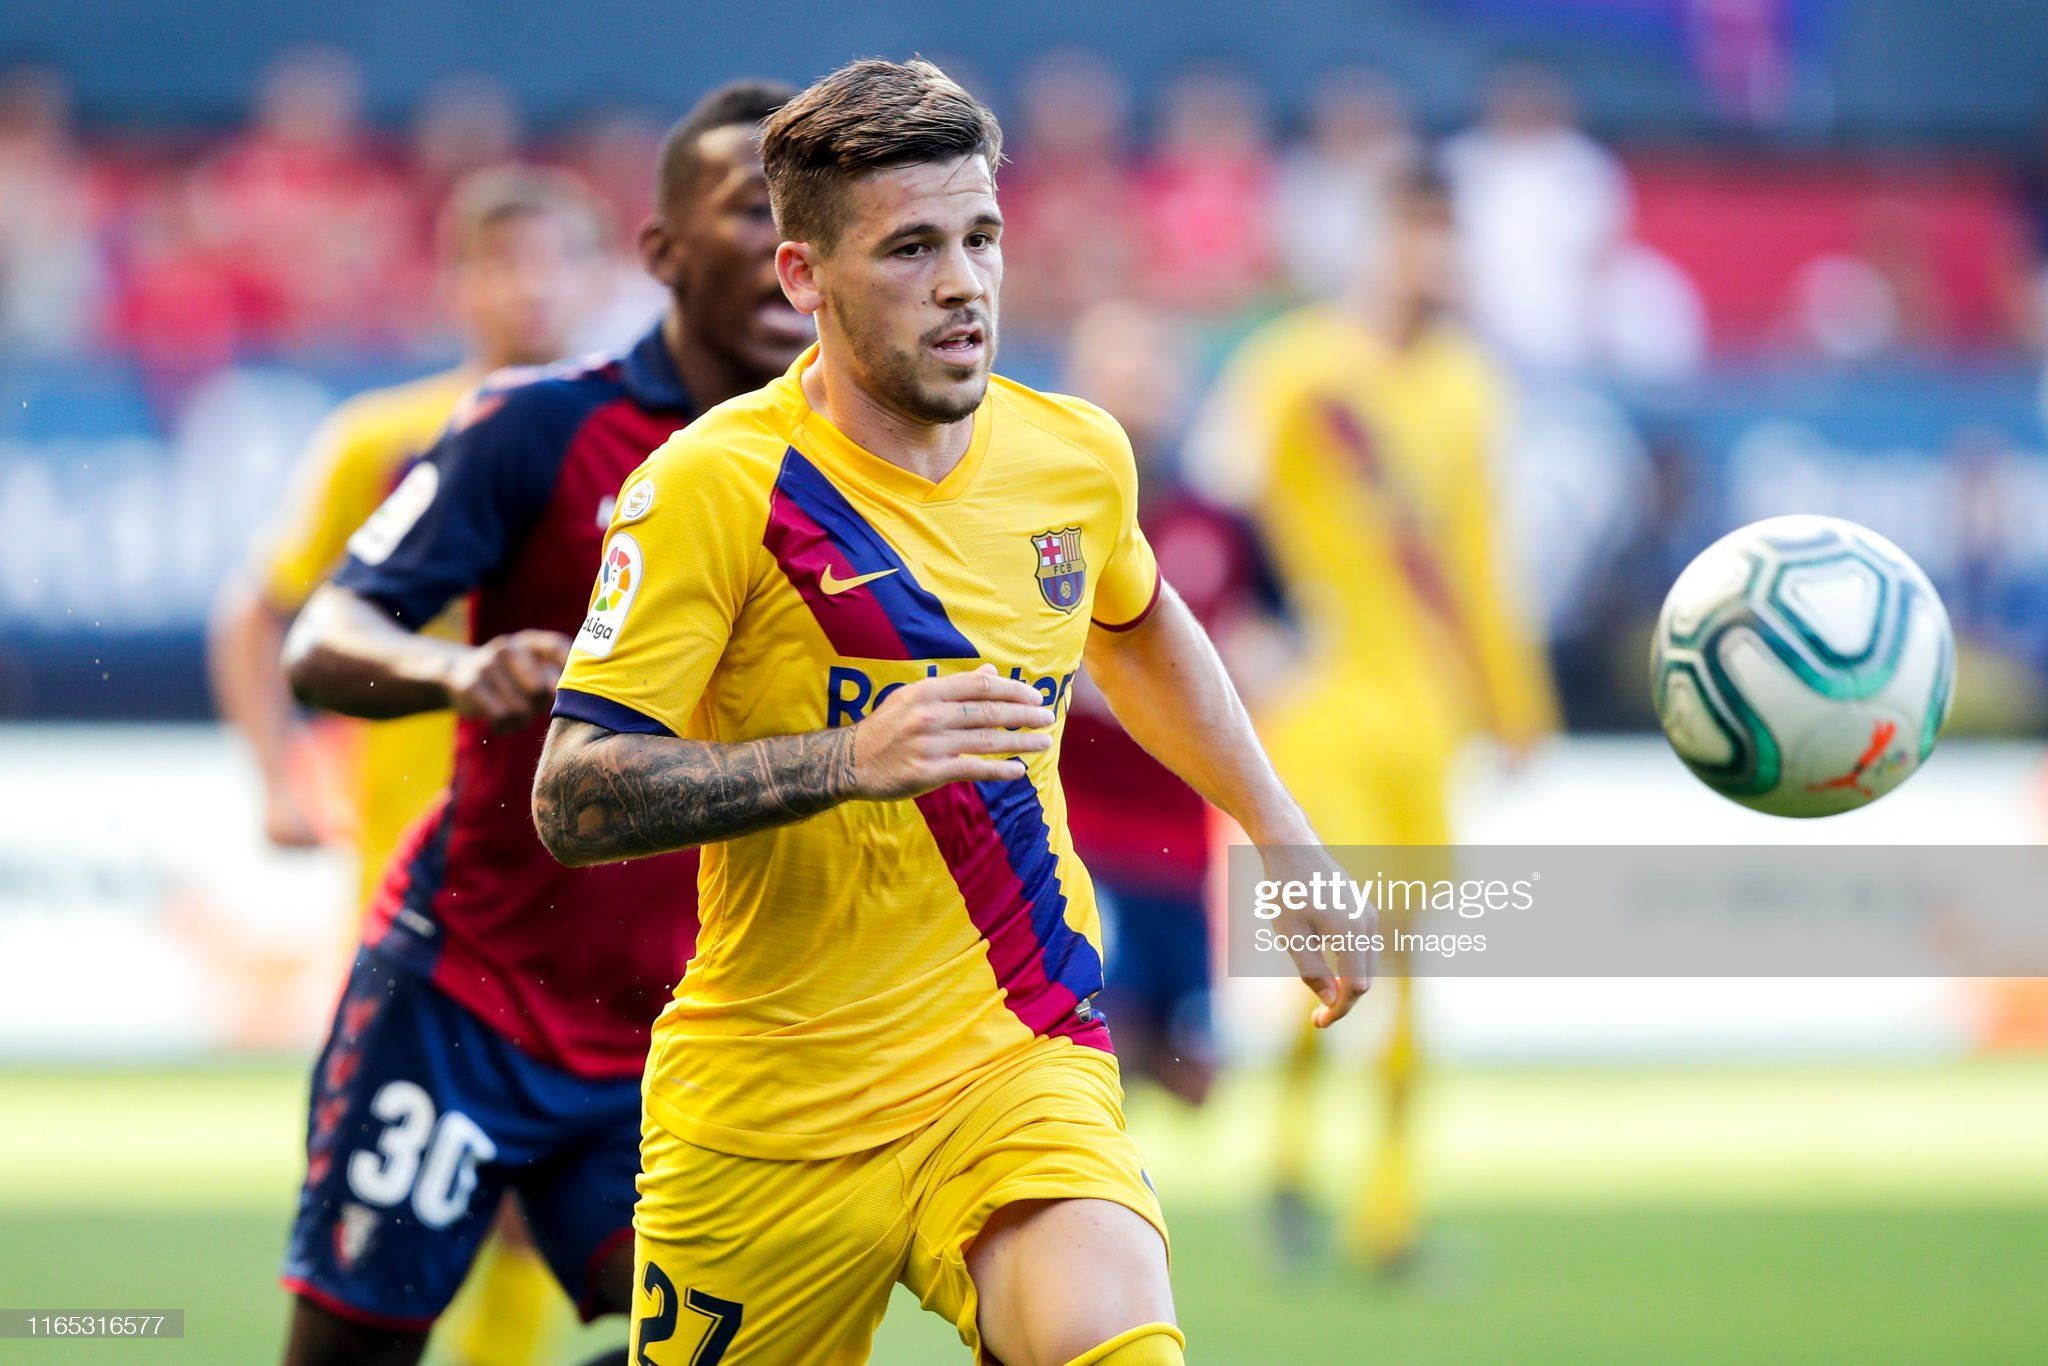 صور مباراة : أوساسونا - برشلونة 2-2 ( 31-08-2019 )  Carles-perez-of-fc-barcelona-during-the-la-liga-santander-match-v-picture-id1165316577?s=2048x2048